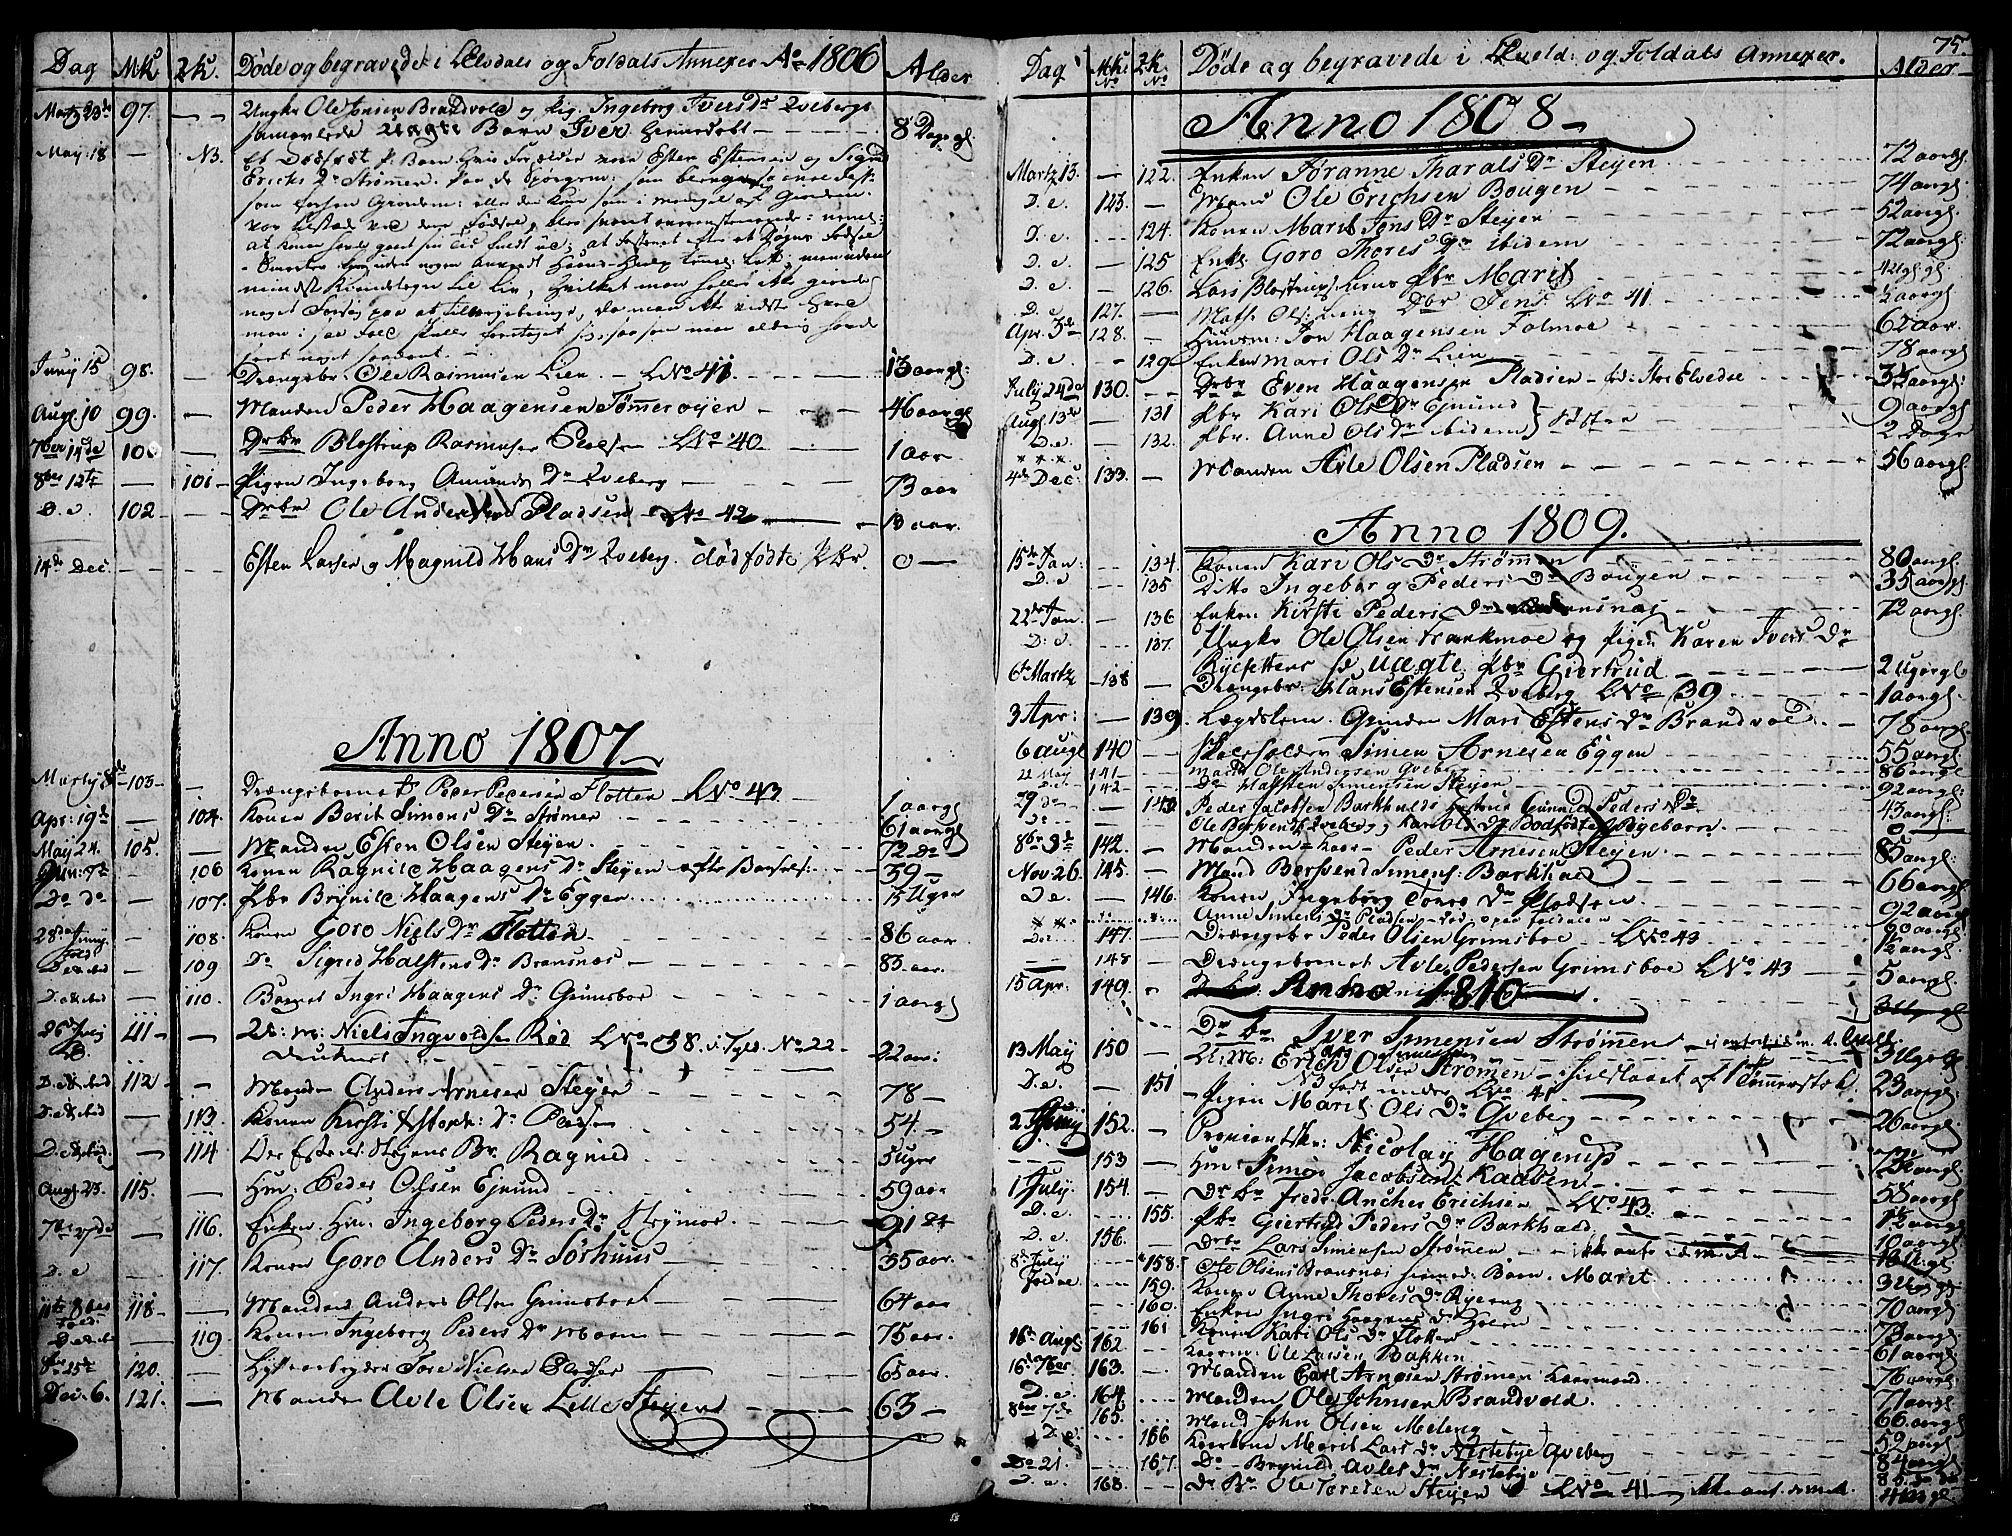 SAH, Tynset prestekontor, Ministerialbok nr. 16, 1801-1814, s. 75